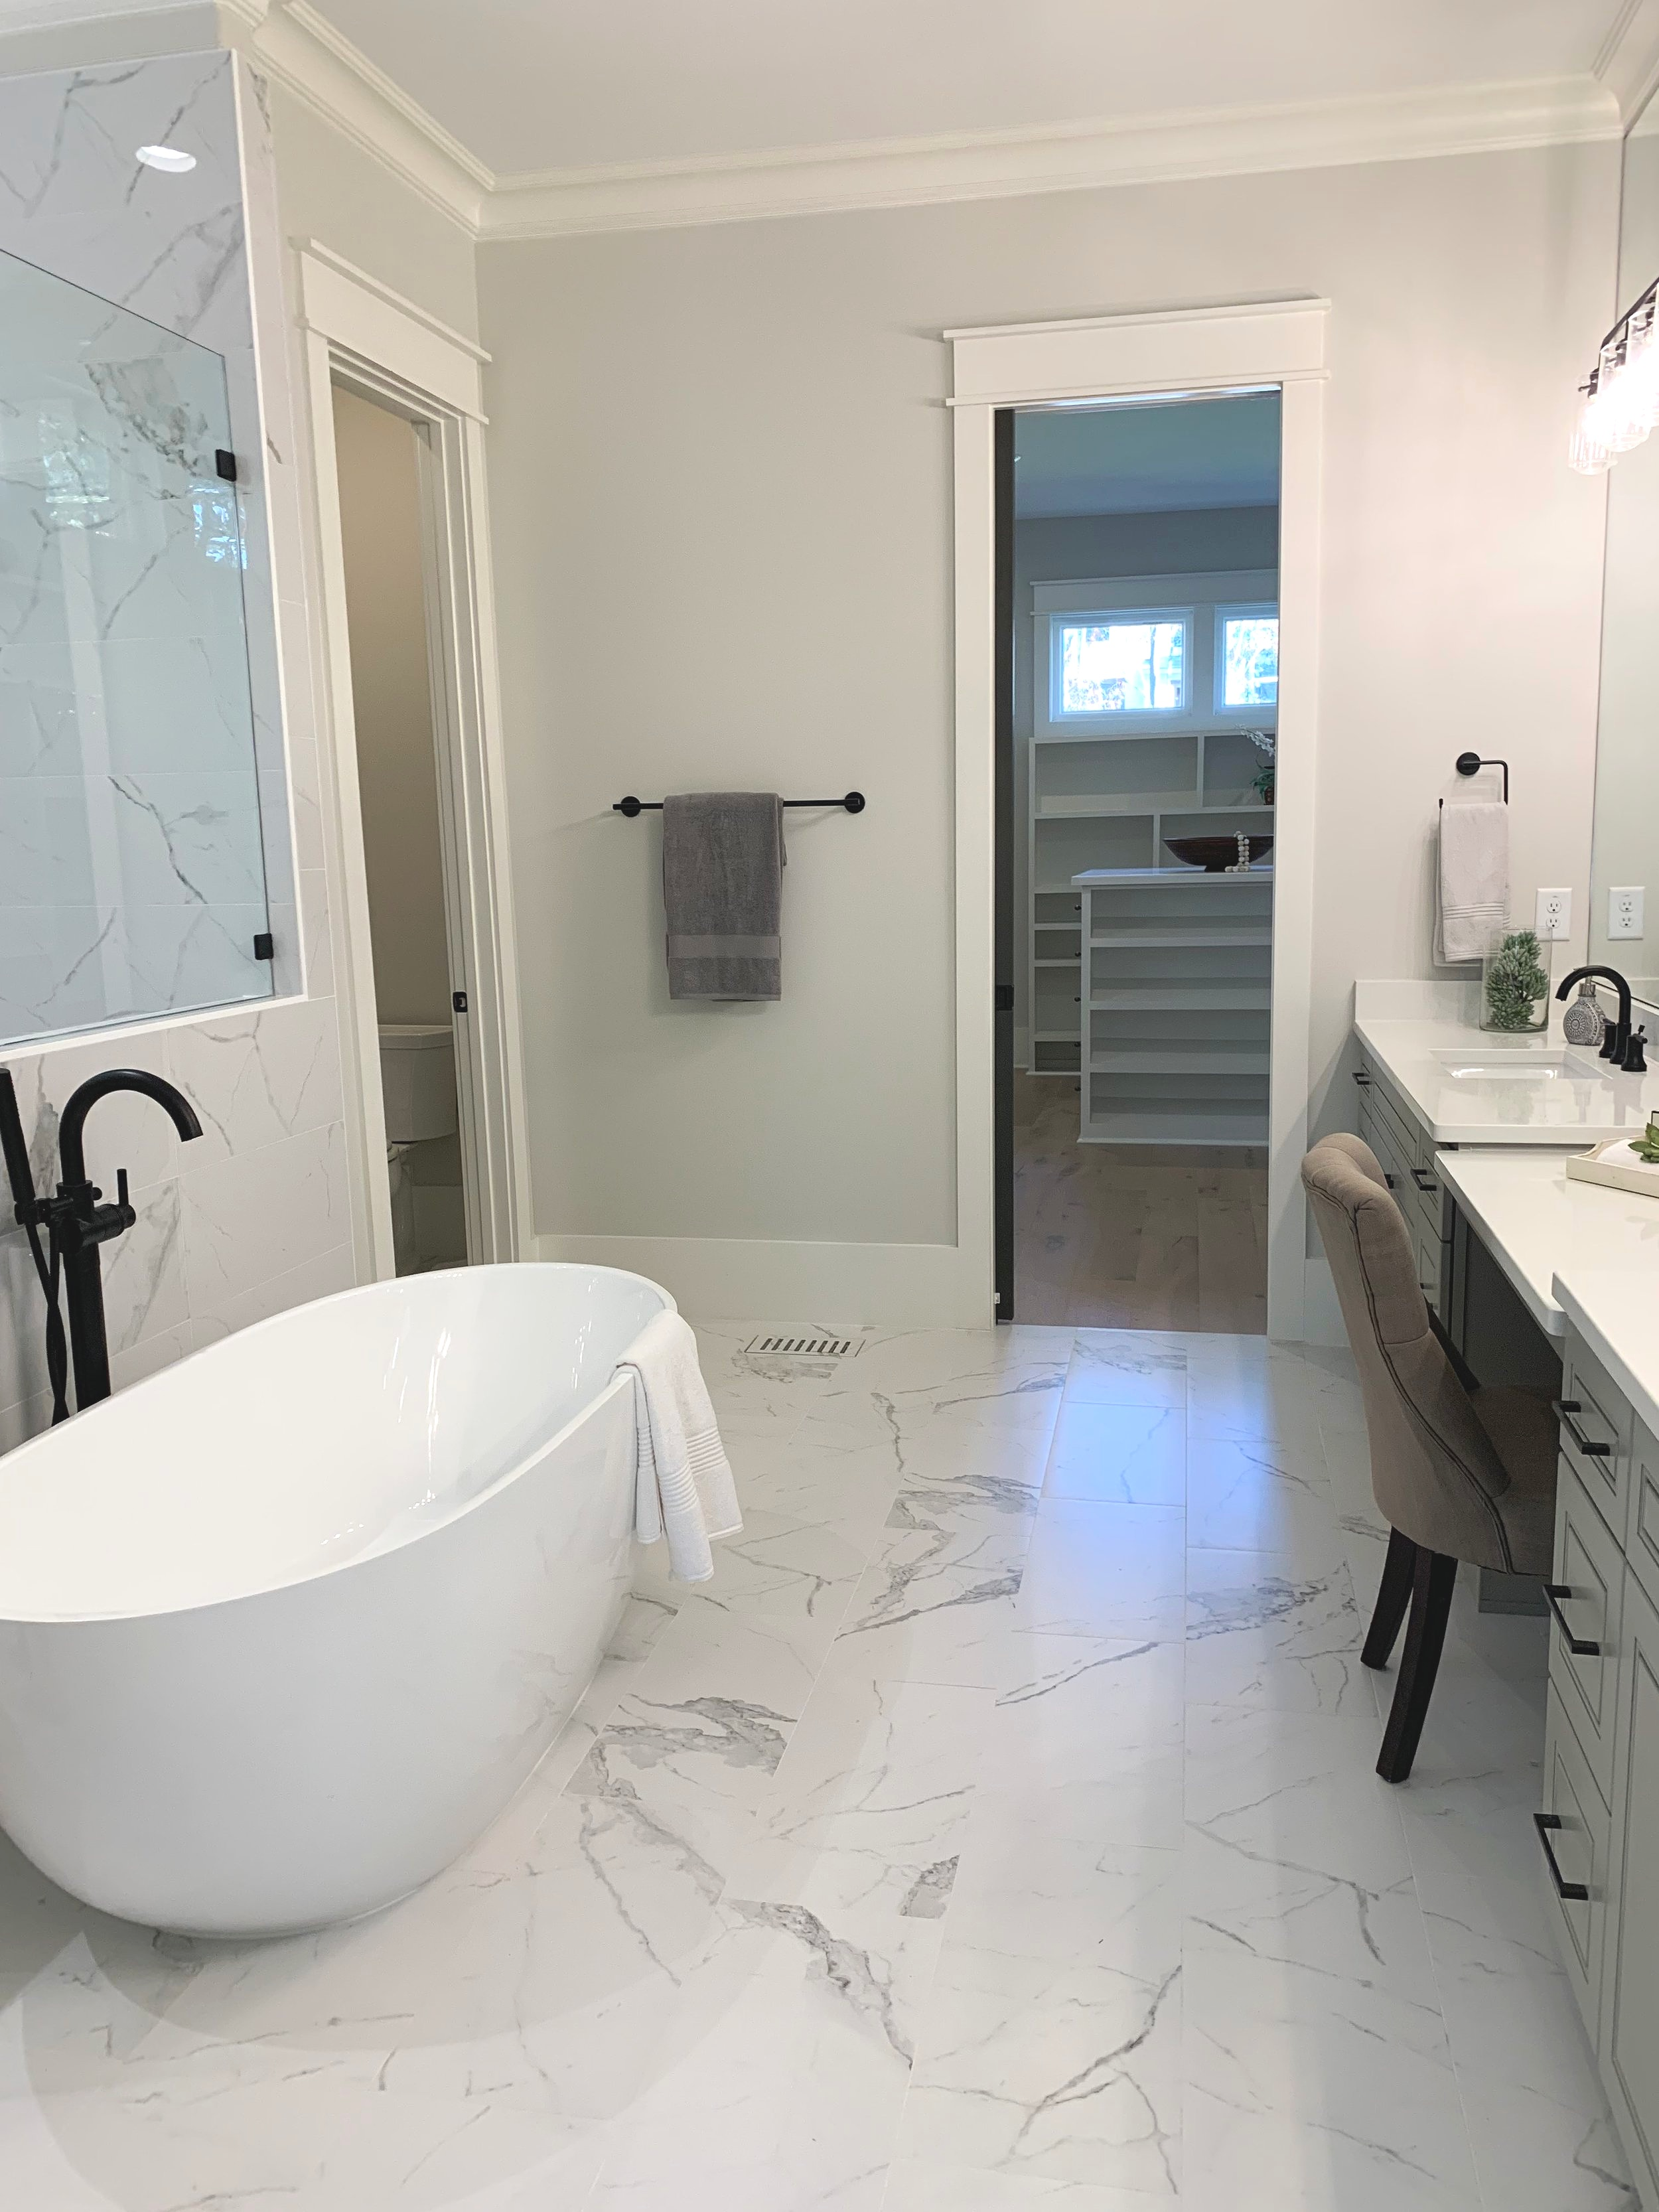 Freestanding tub, tile floor, glass shower, custom closet, master bathroom design ideas, wake forest, parade of homes.